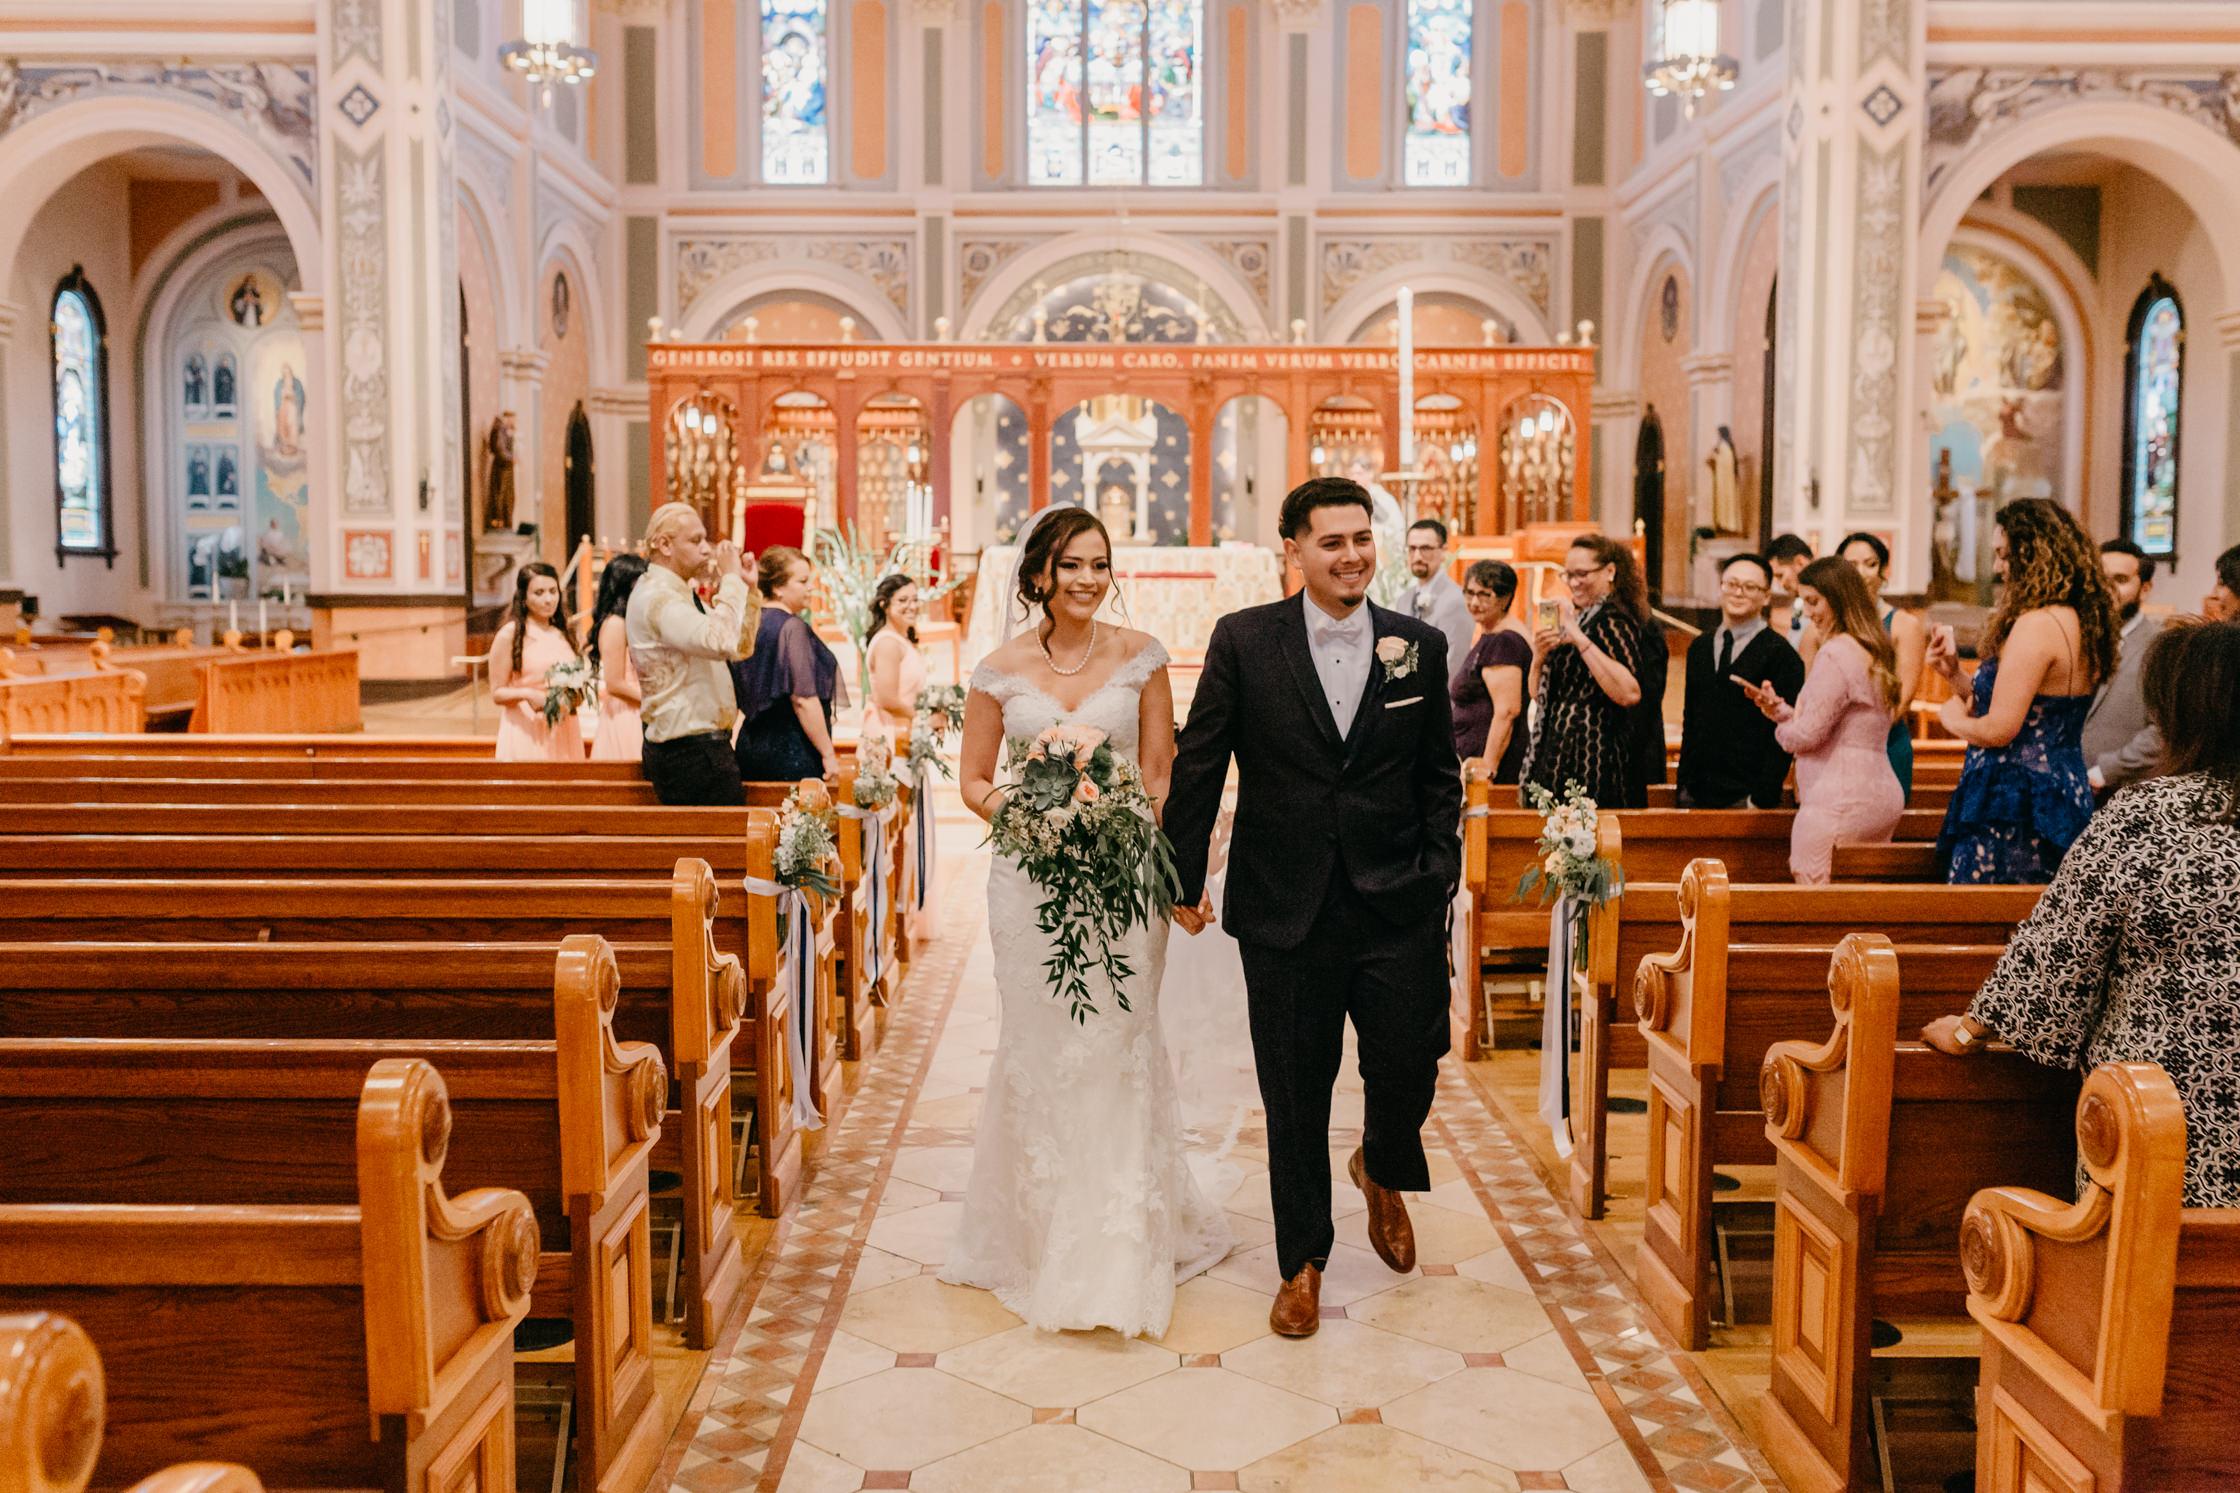 luis_joanna_wedding-45.jpg